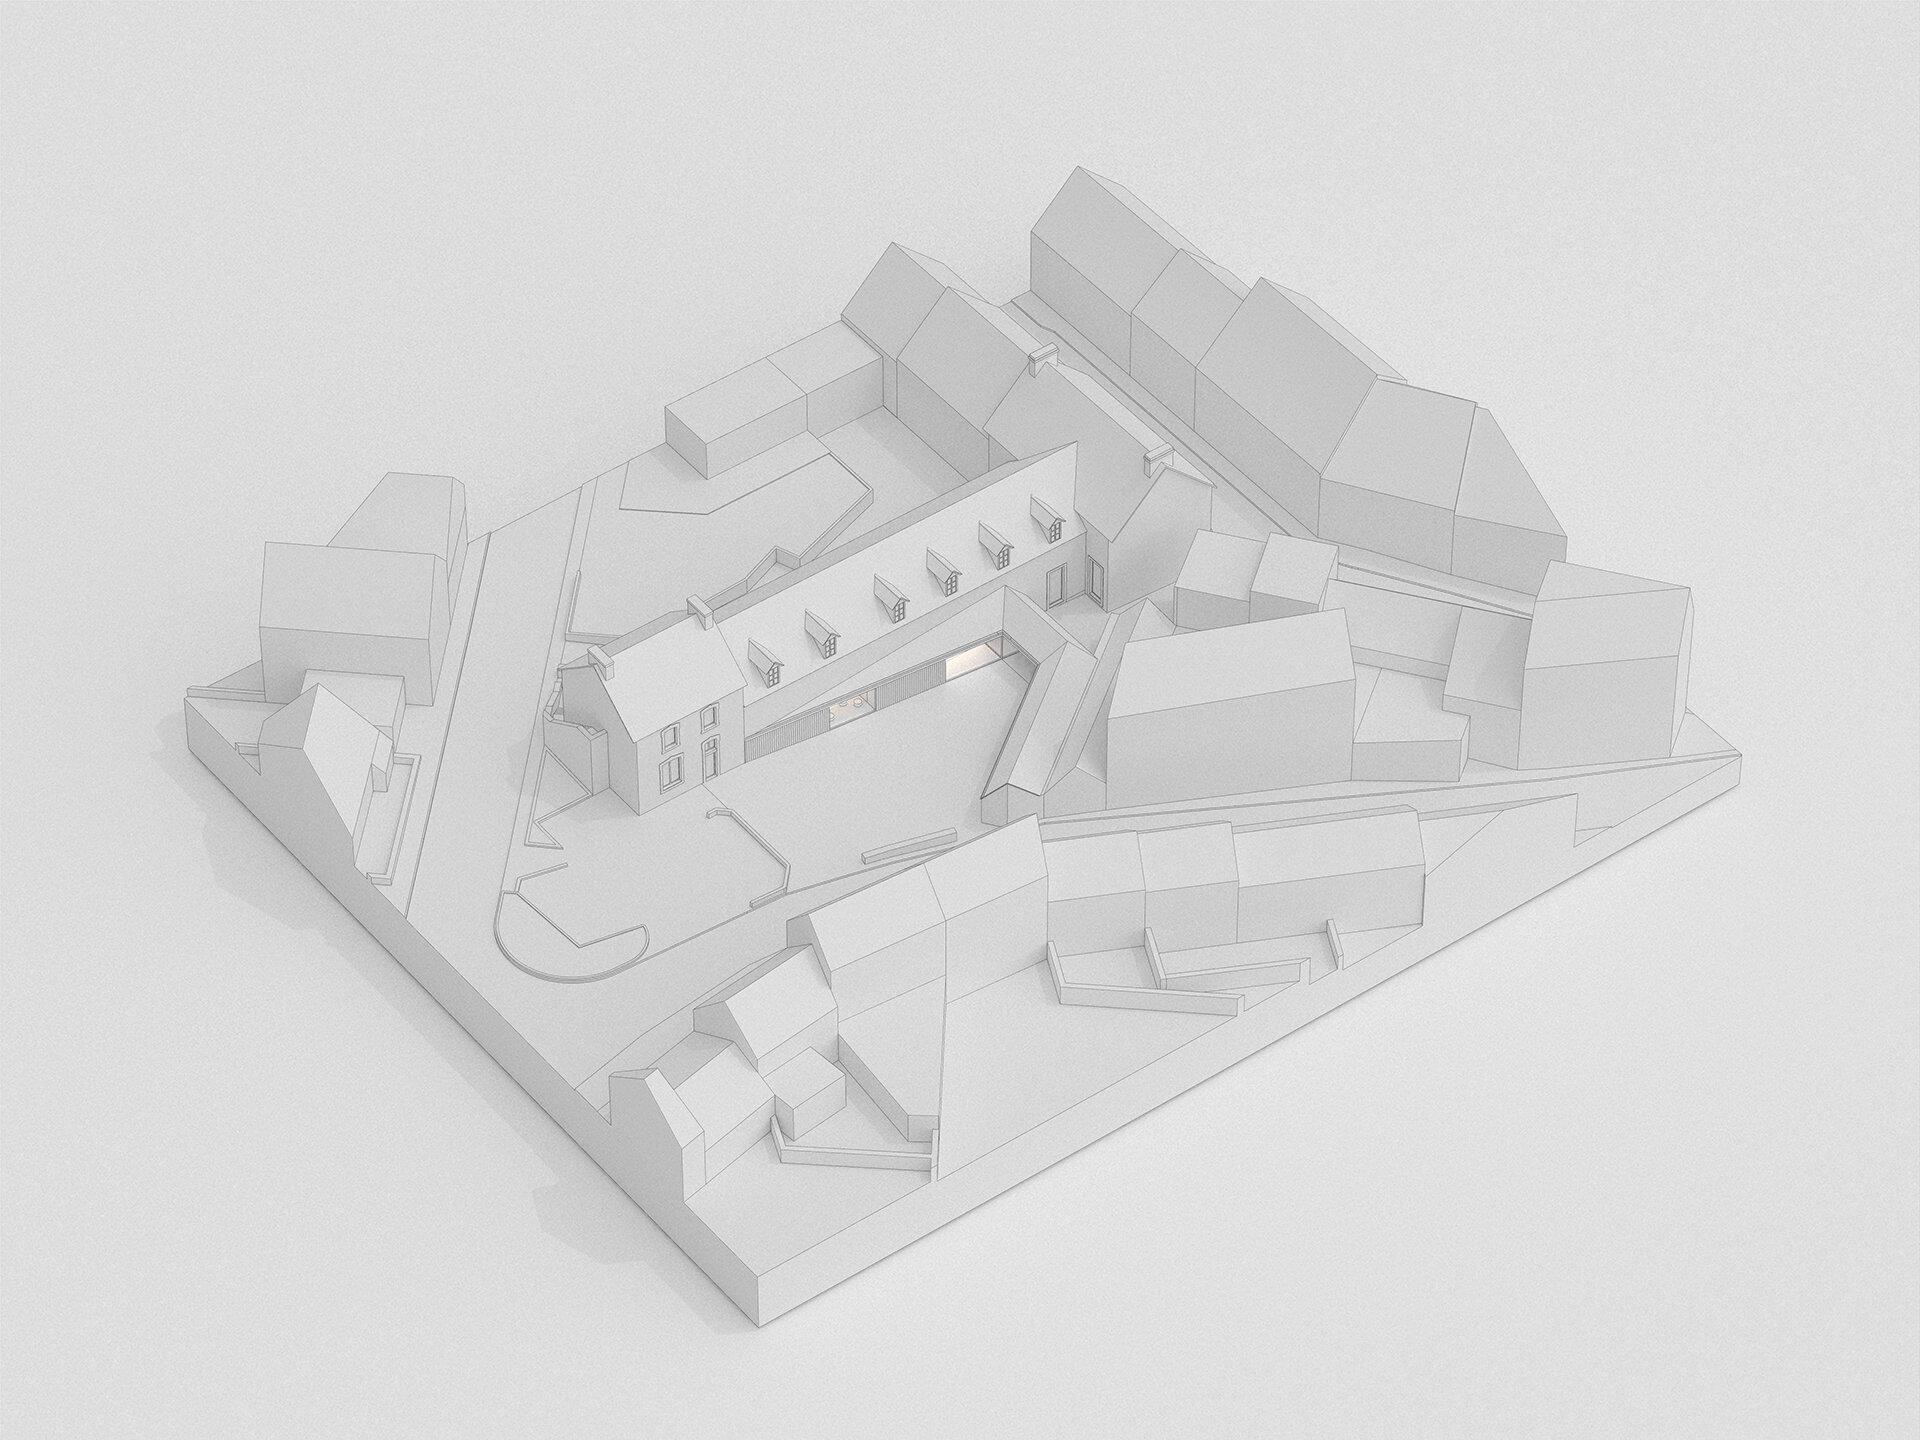 jean-francois-madec-elliant-maquette-01.jpg